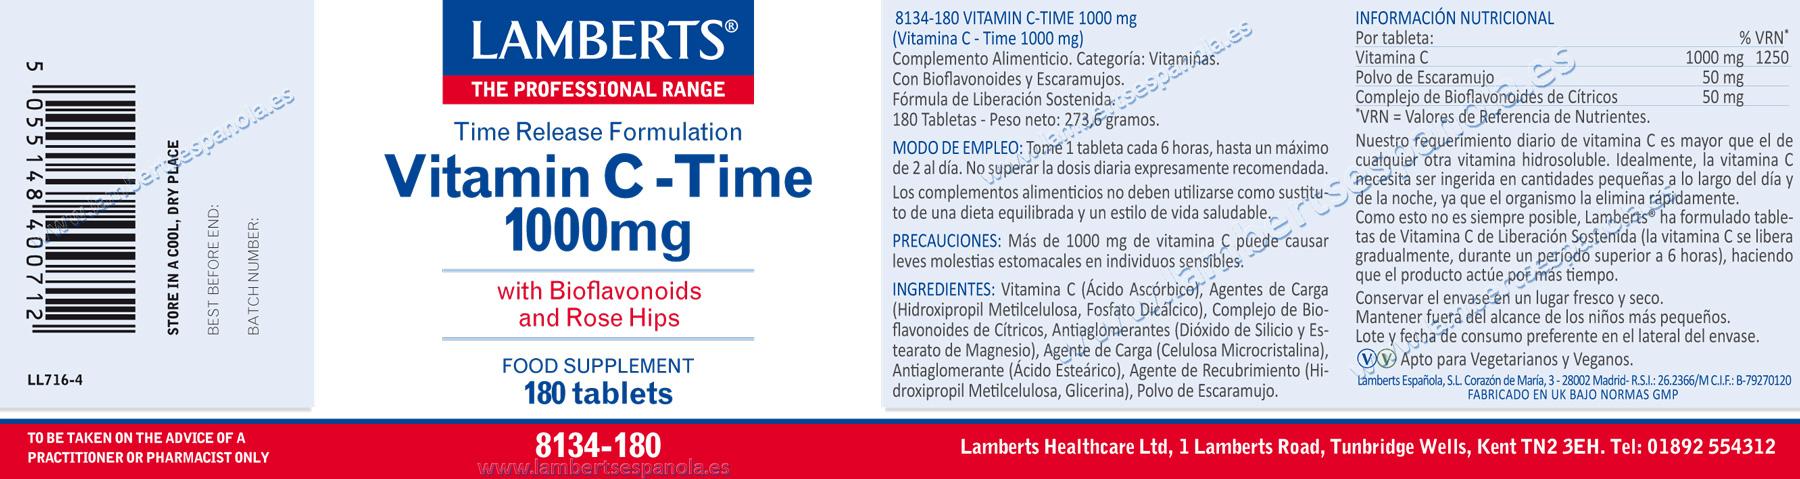 Vitamina C de liberación sostenida 1000 mg